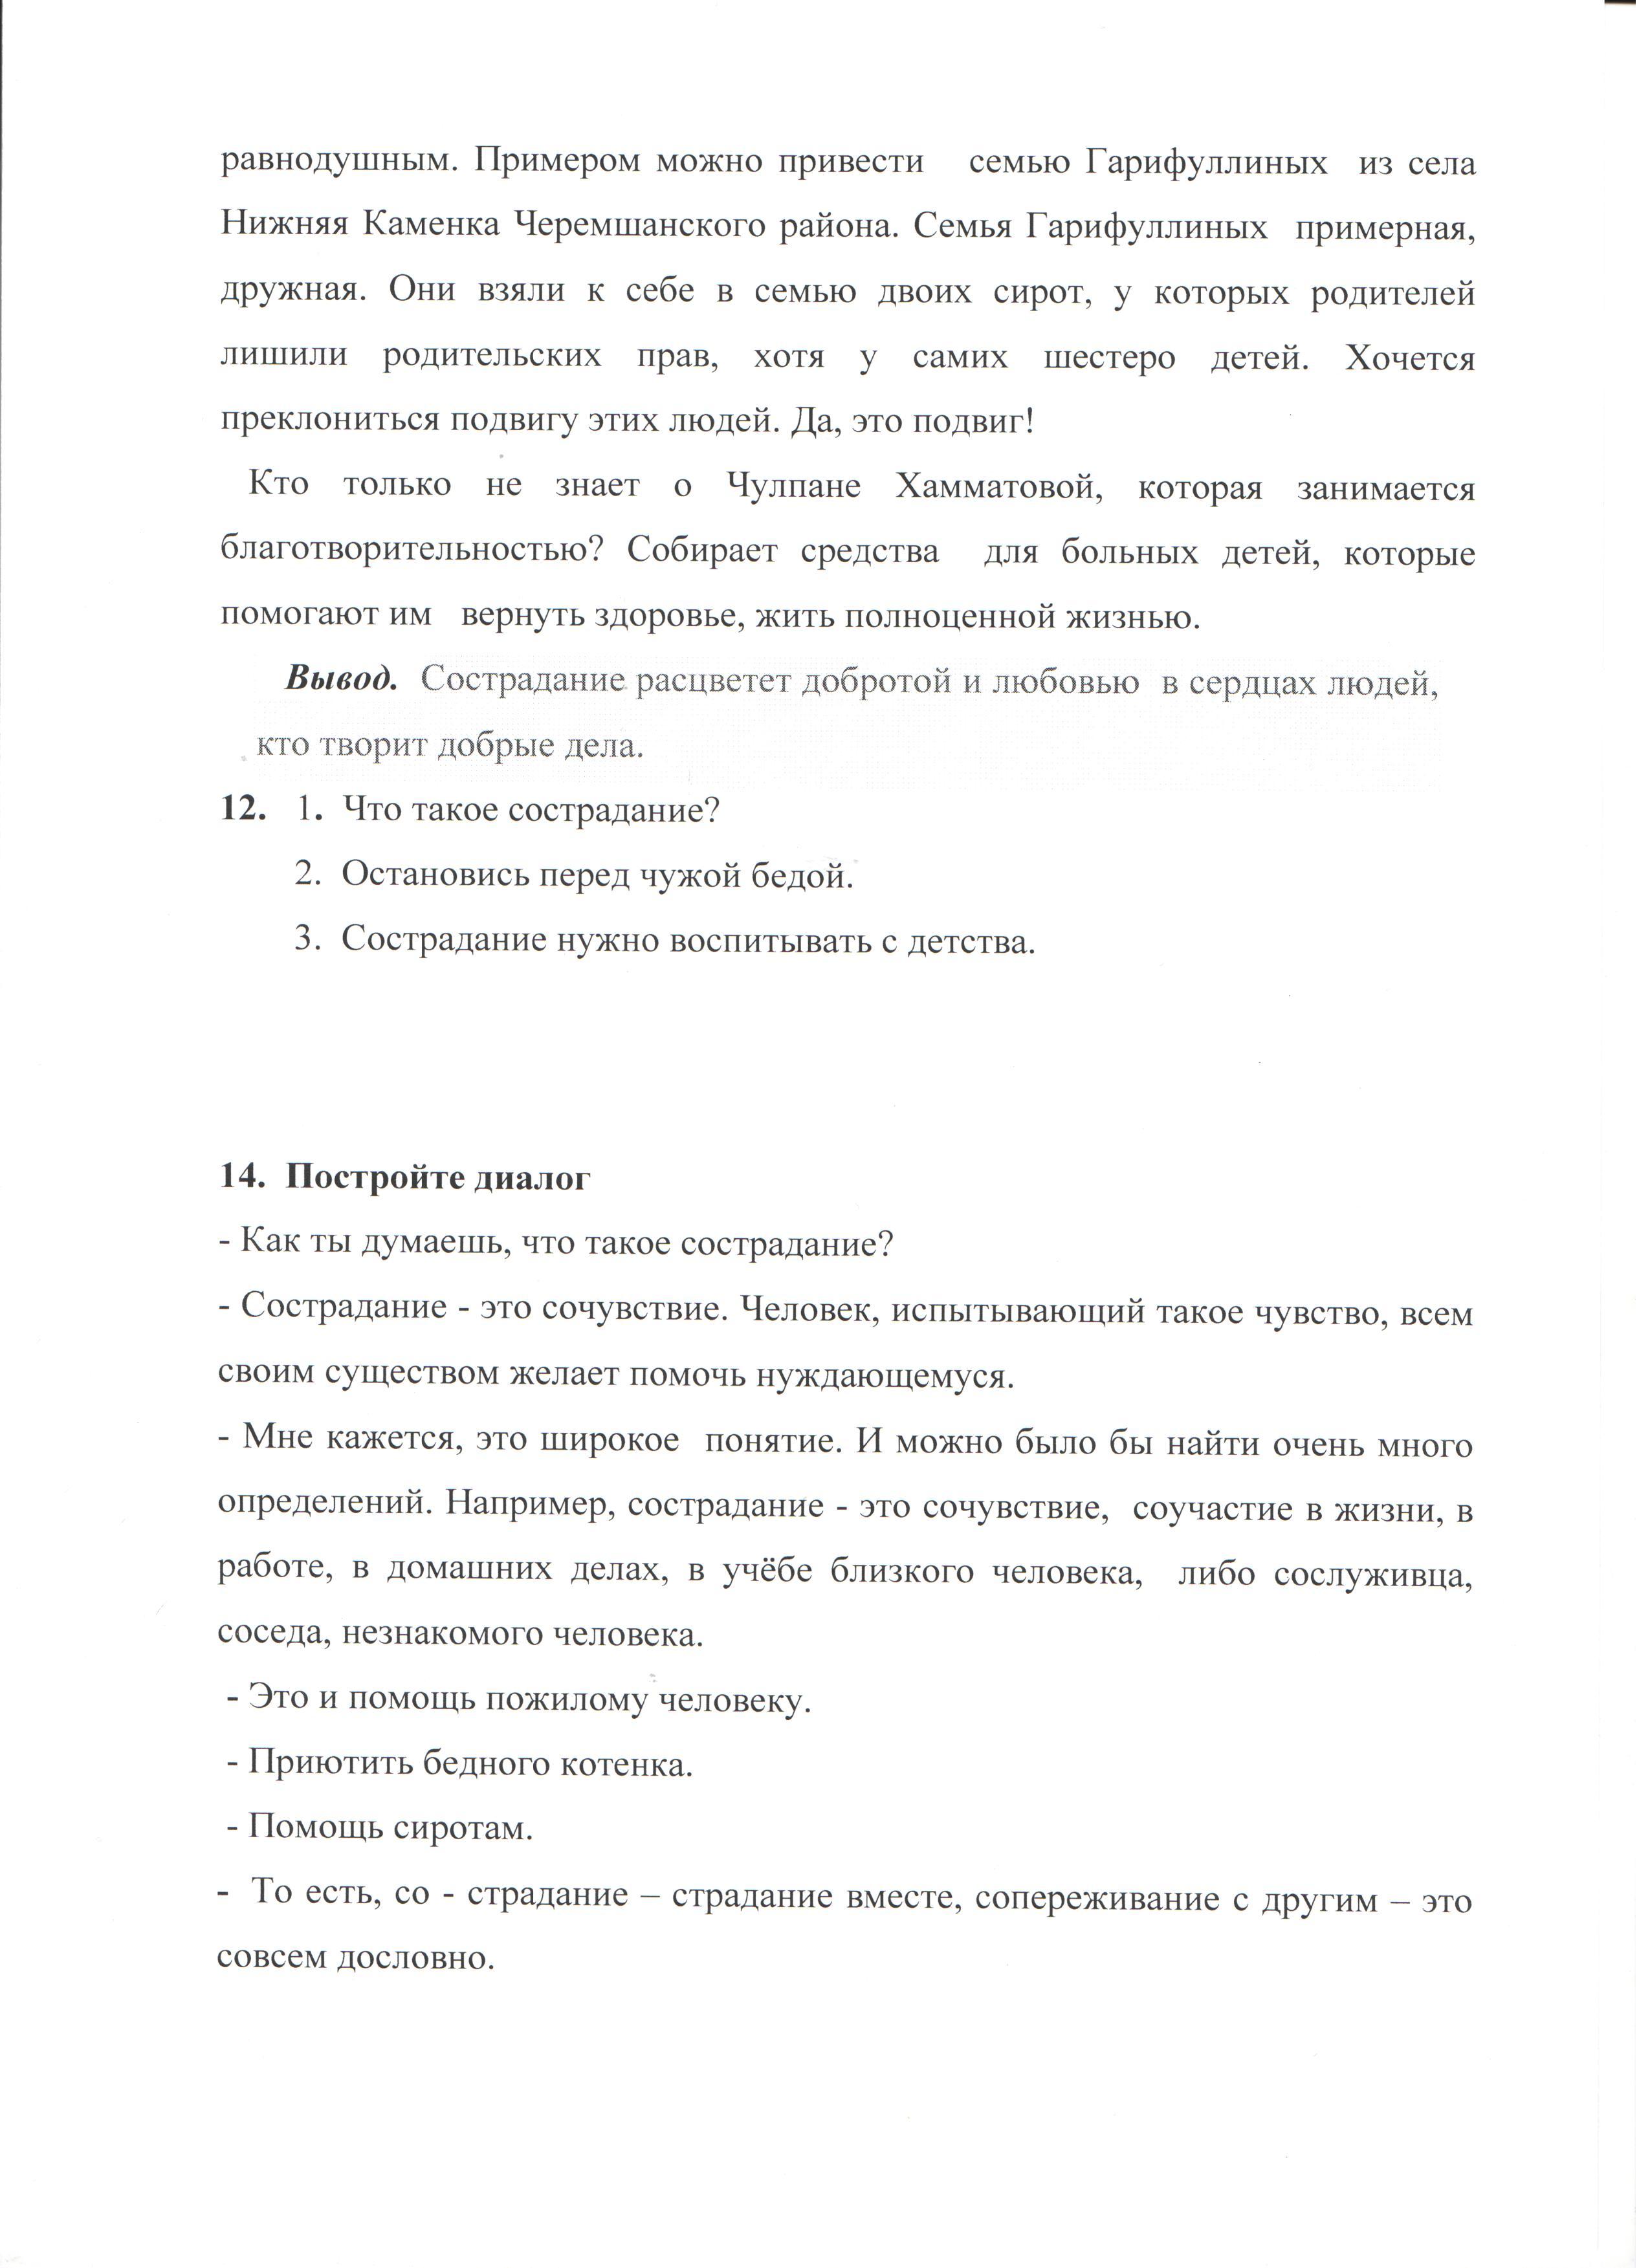 C:\Documents and Settings\Admin\Мои документы\Мои рисунки\Изображение 014.jpg